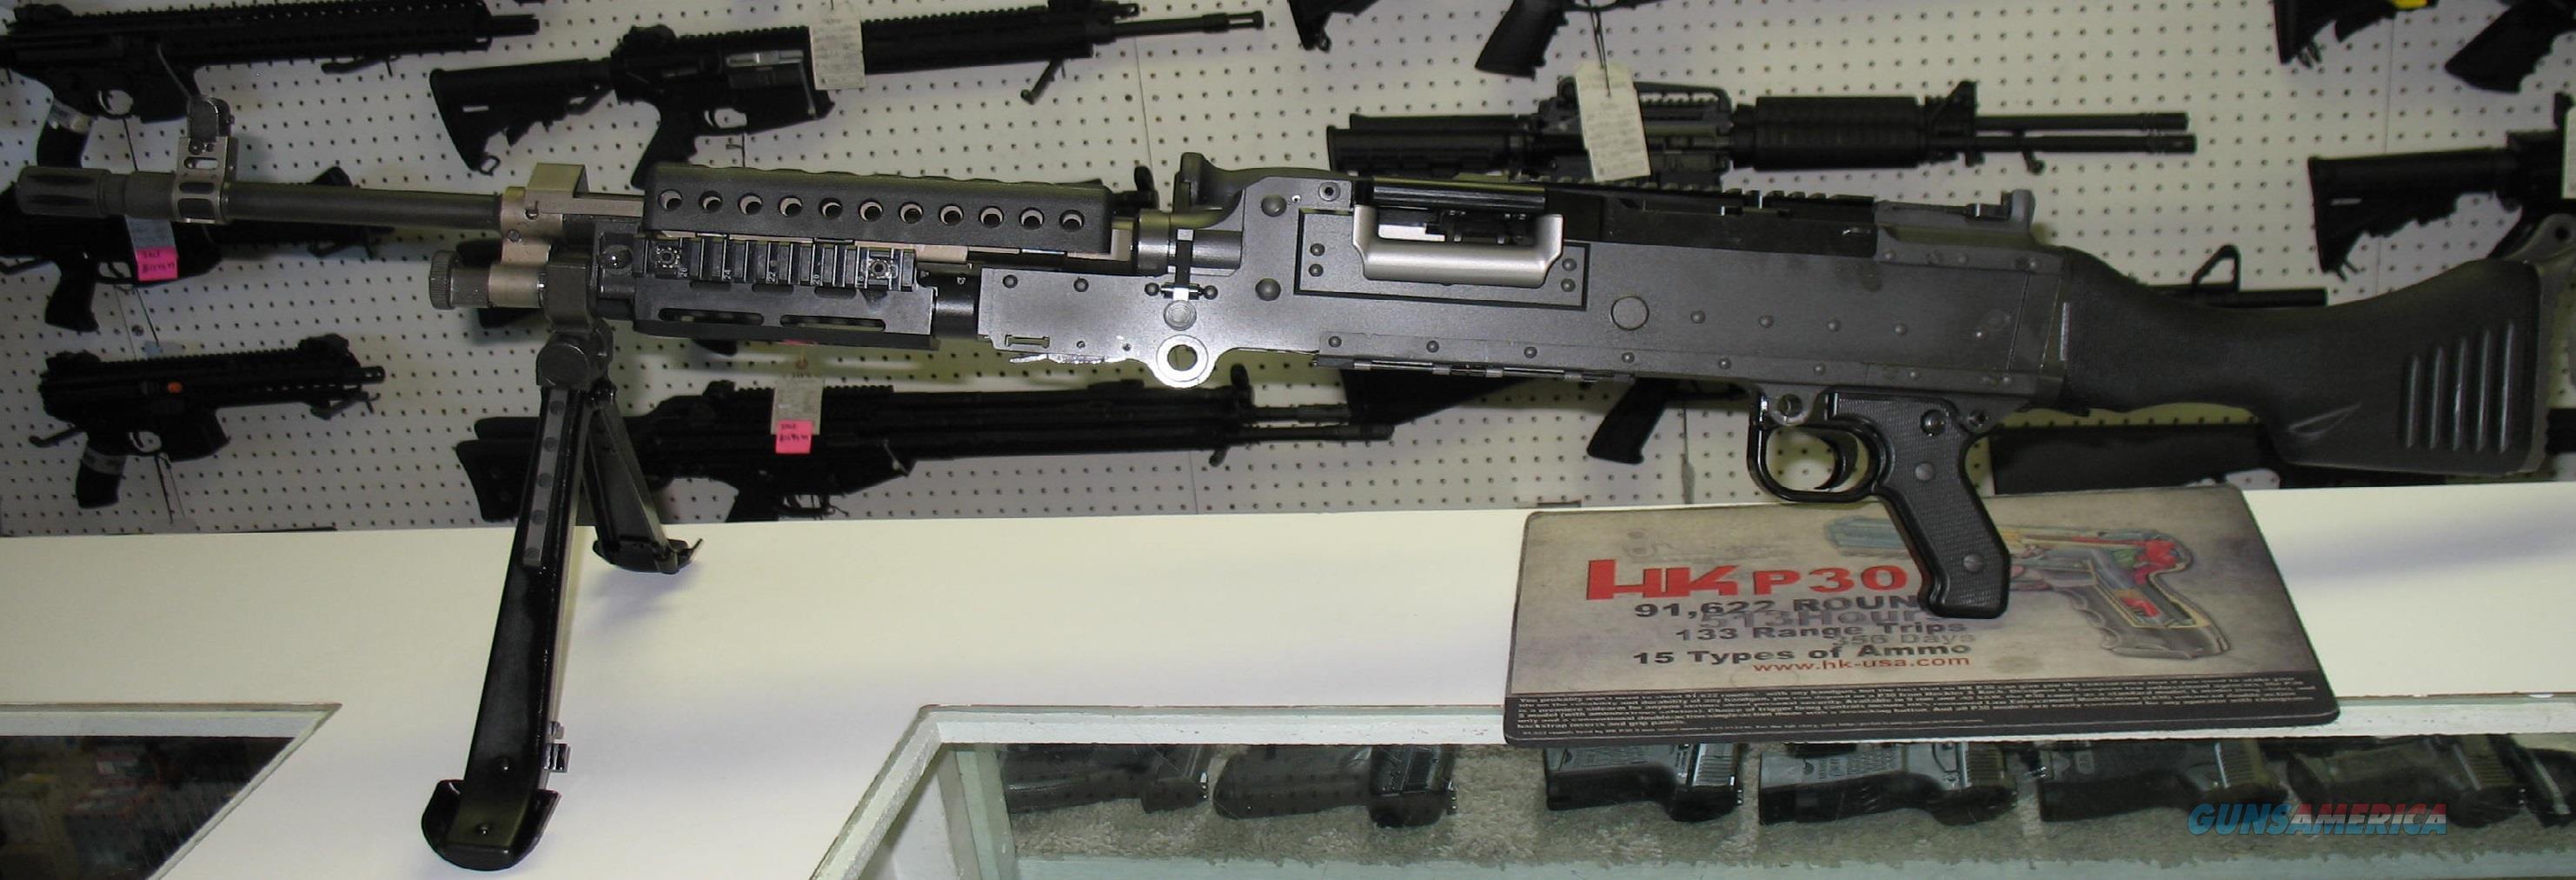 Ohio Ordnance Works, Inc. M240-SLR .308 For Sale